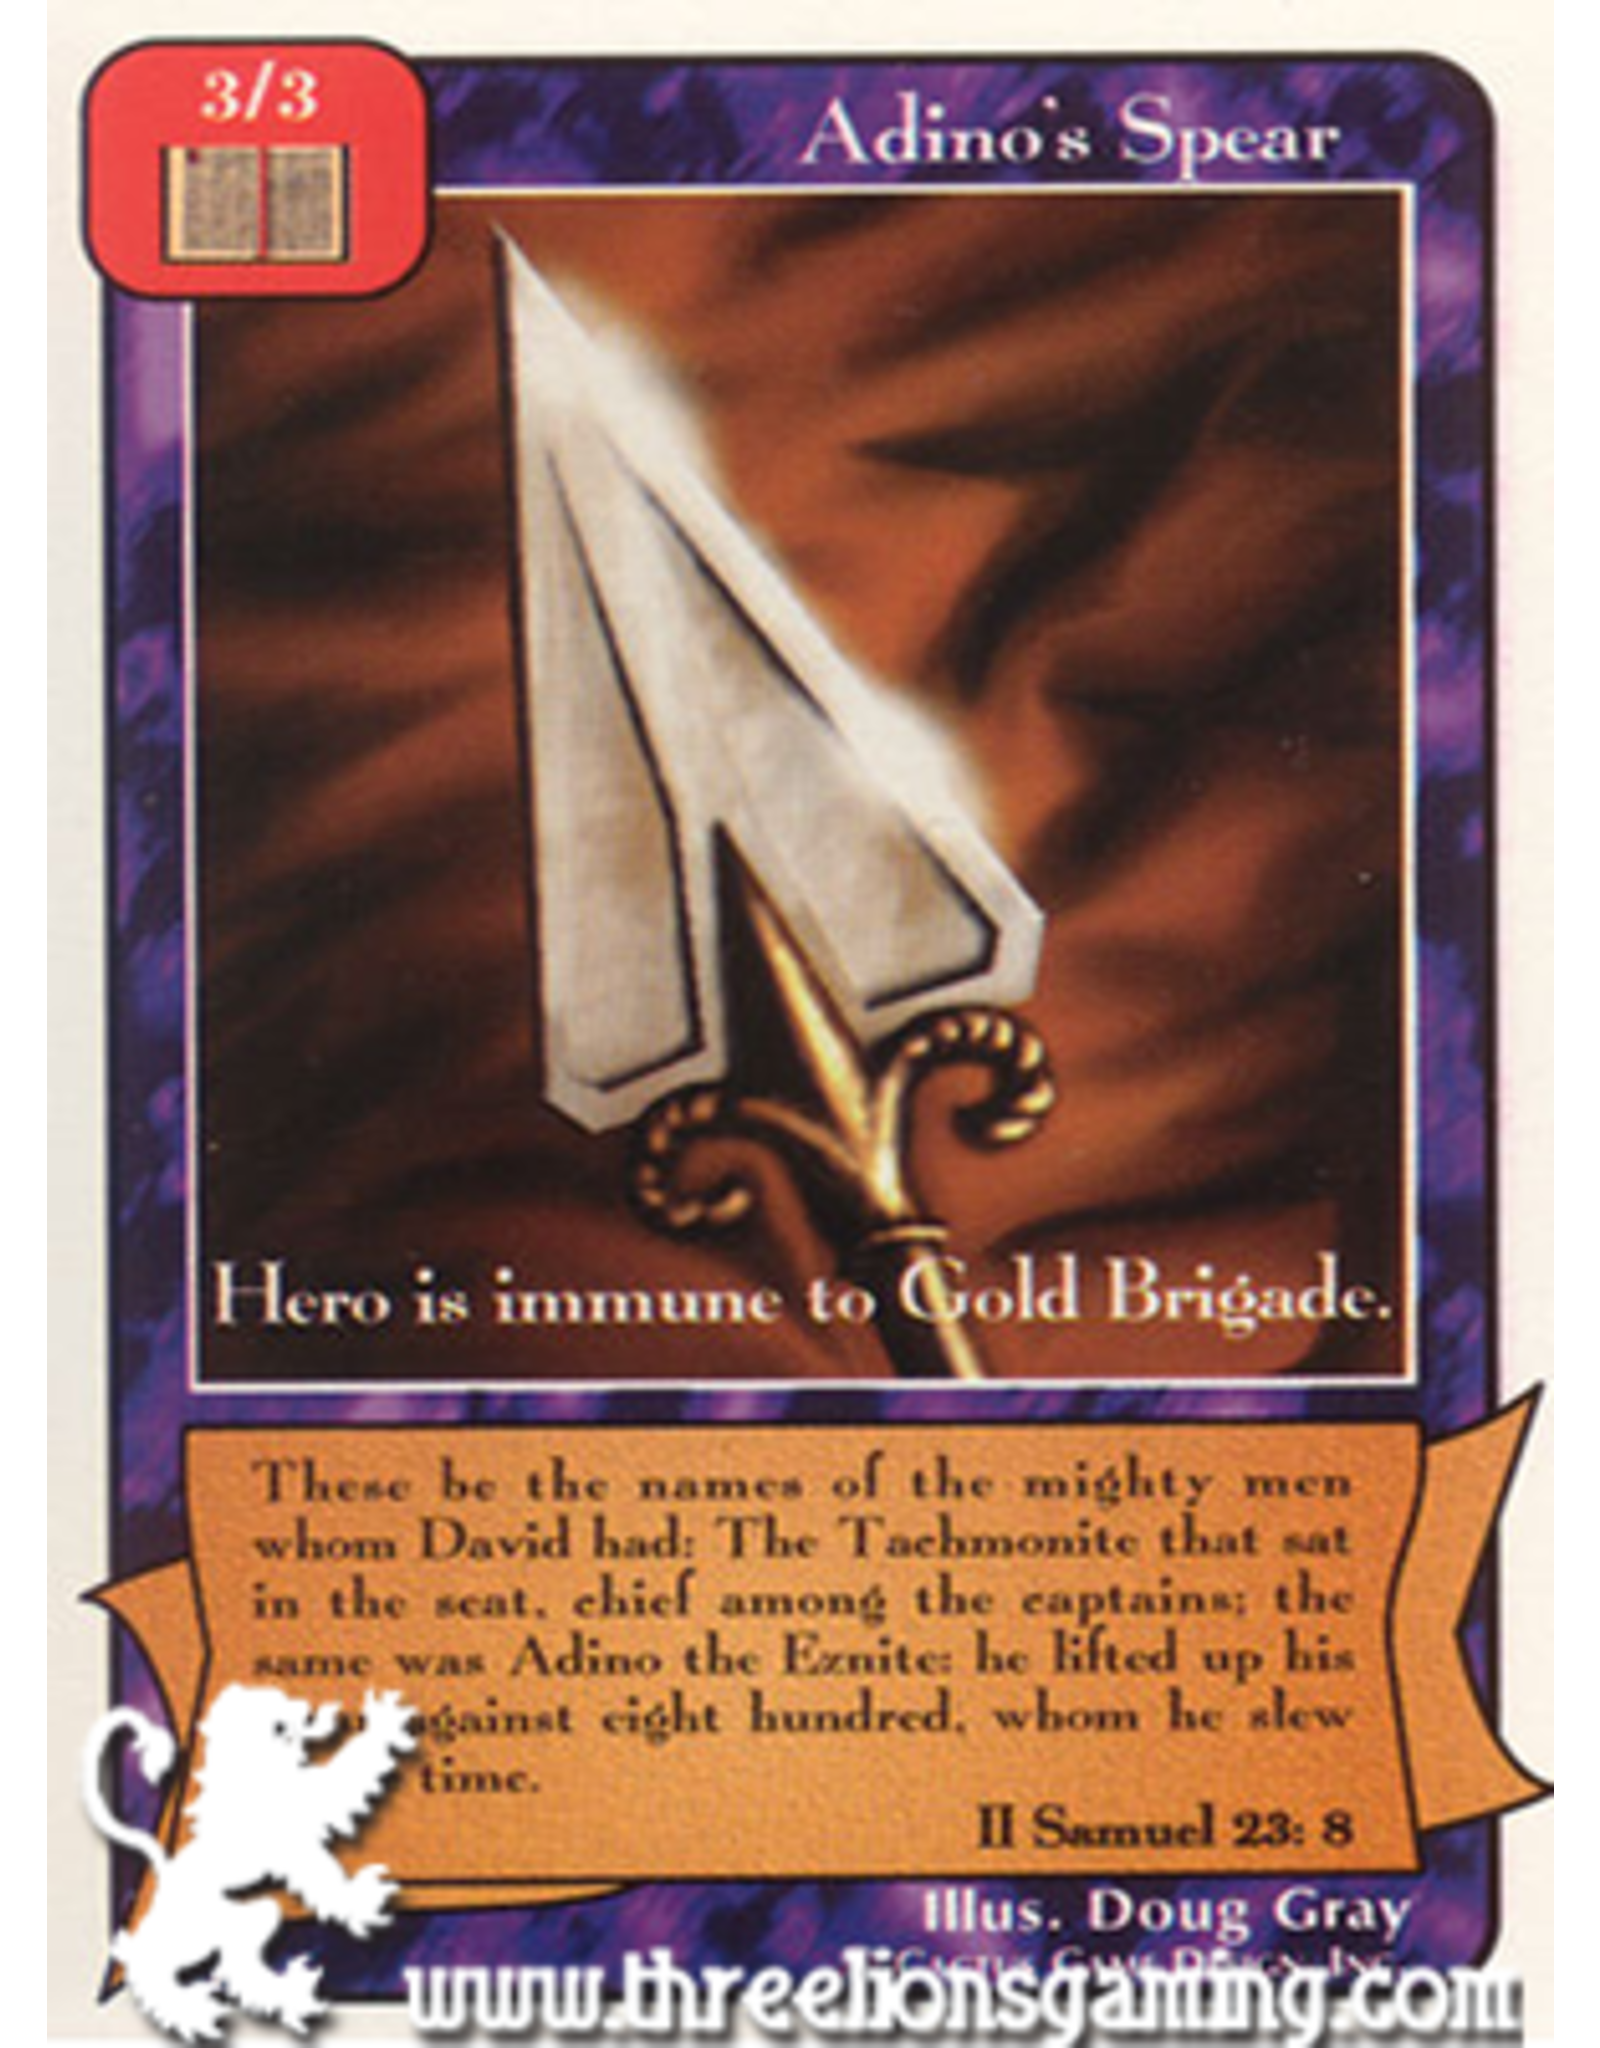 Wa: Adino's Spear